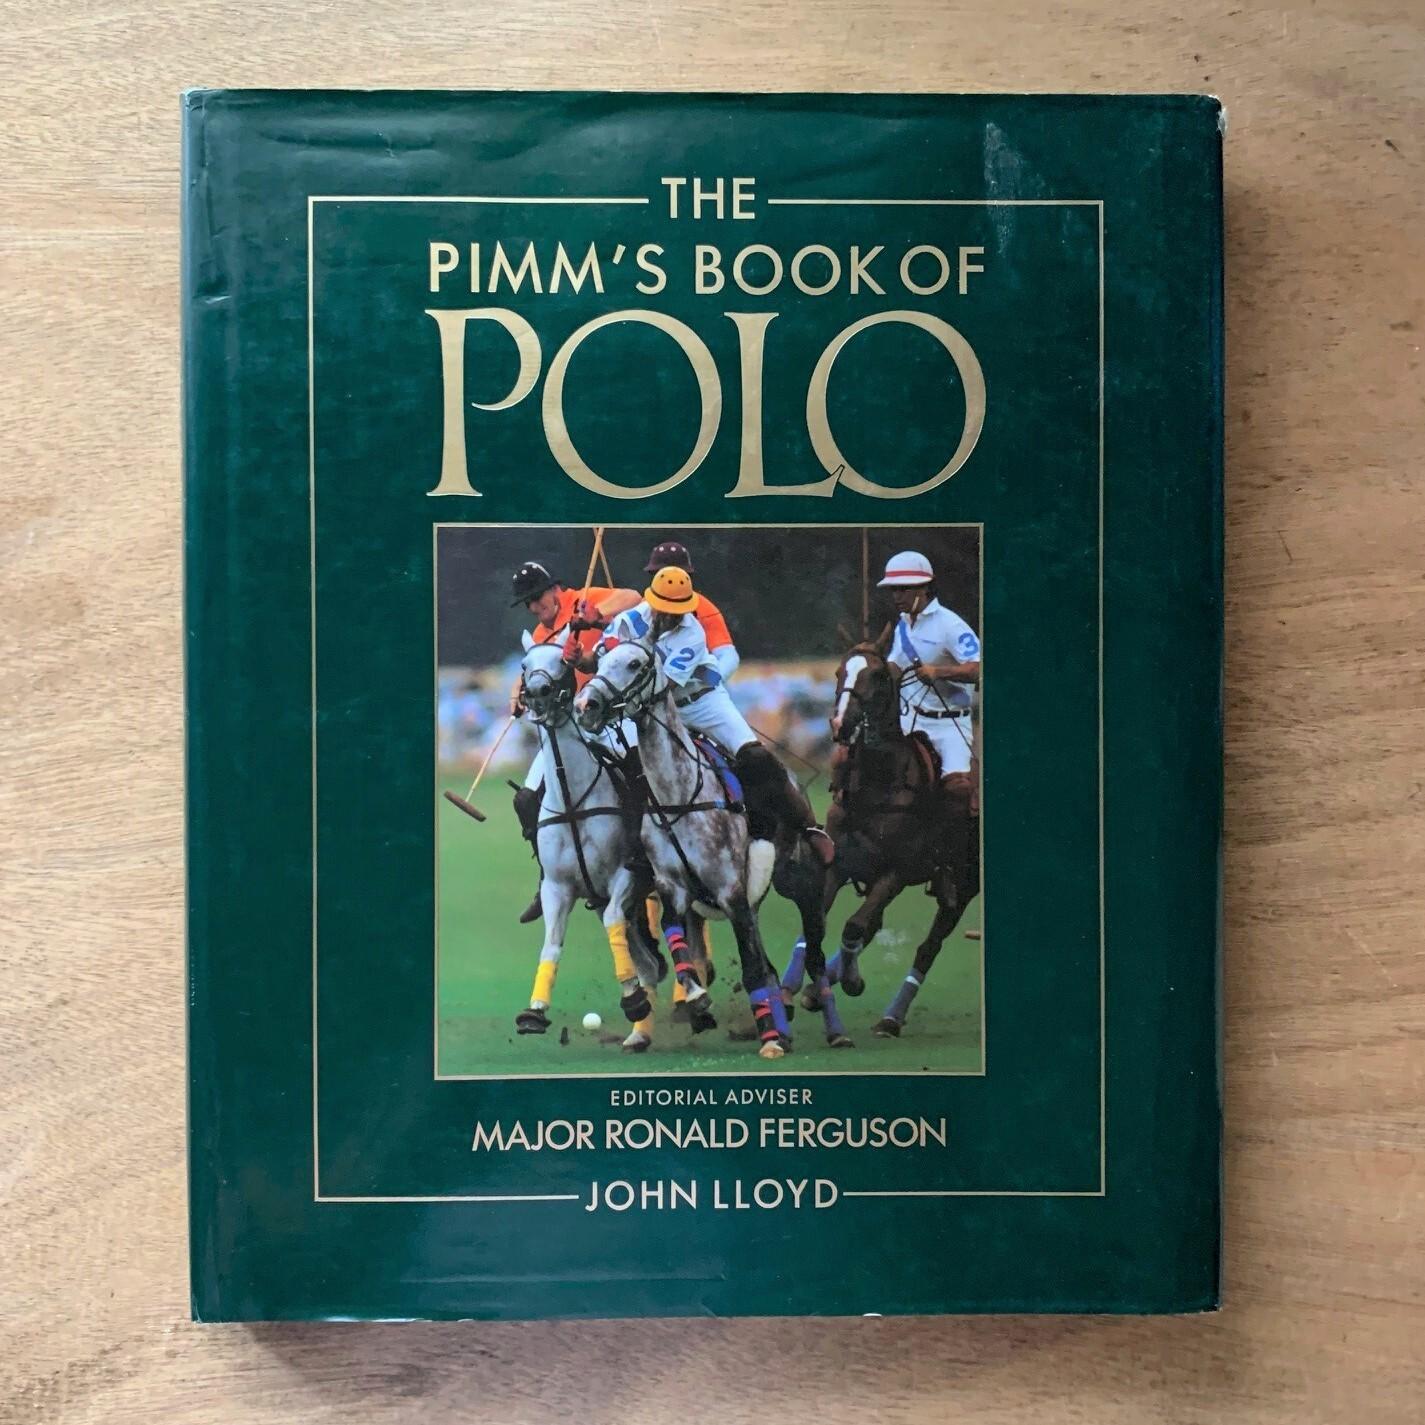 The Pimm's Book of Polo / John Lloyd